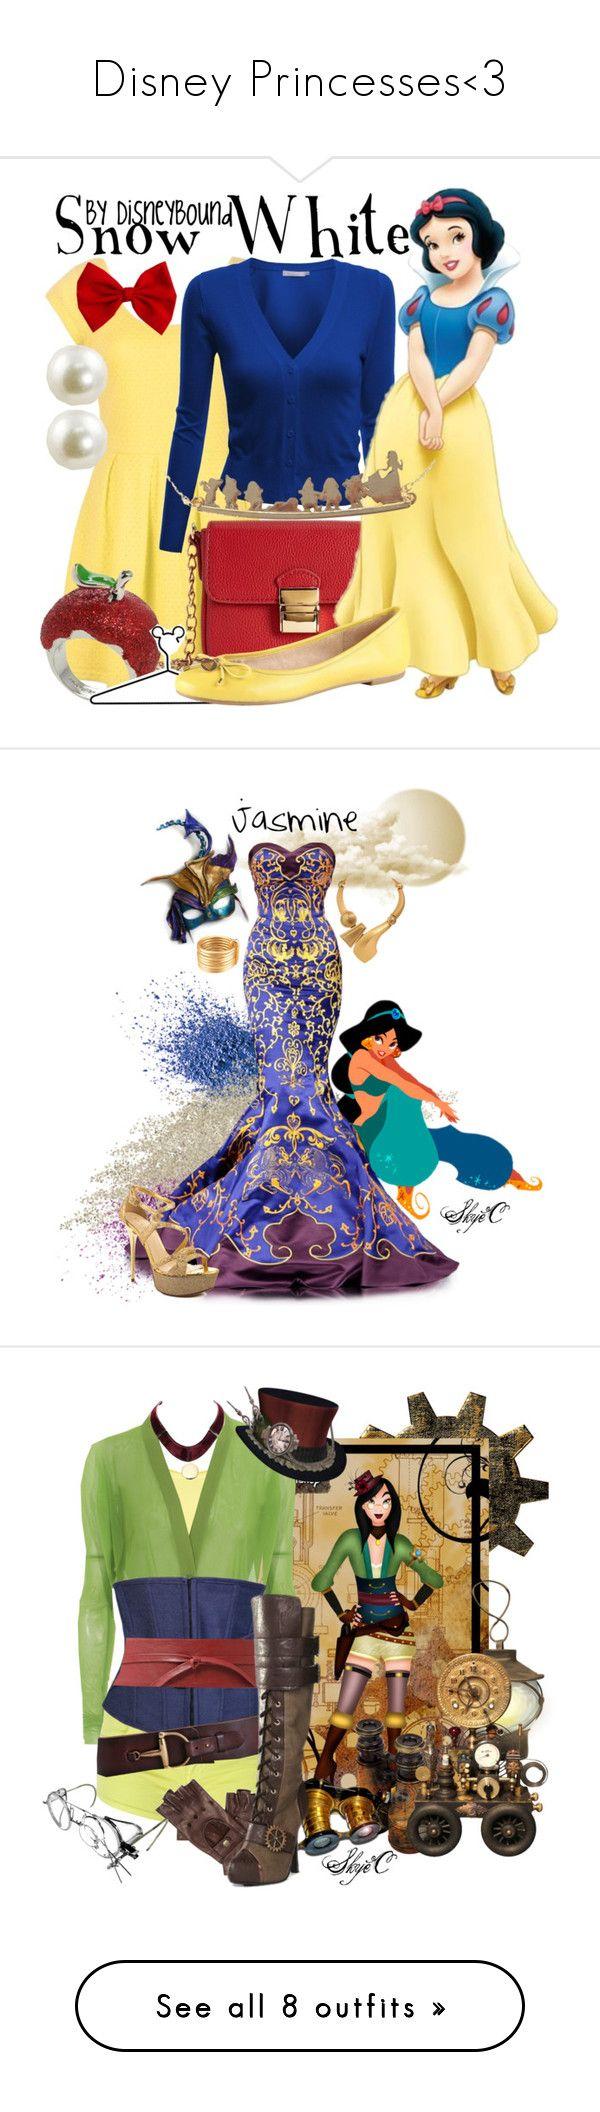 """Disney Princesses<3"" by rael01 ❤ liked on Polyvore featuring Doublju, Forever 21, Disney, ALDO, Meli Melo, Napoleon Perdis, Monies, Masquerade, GUESS and Vila Milano"